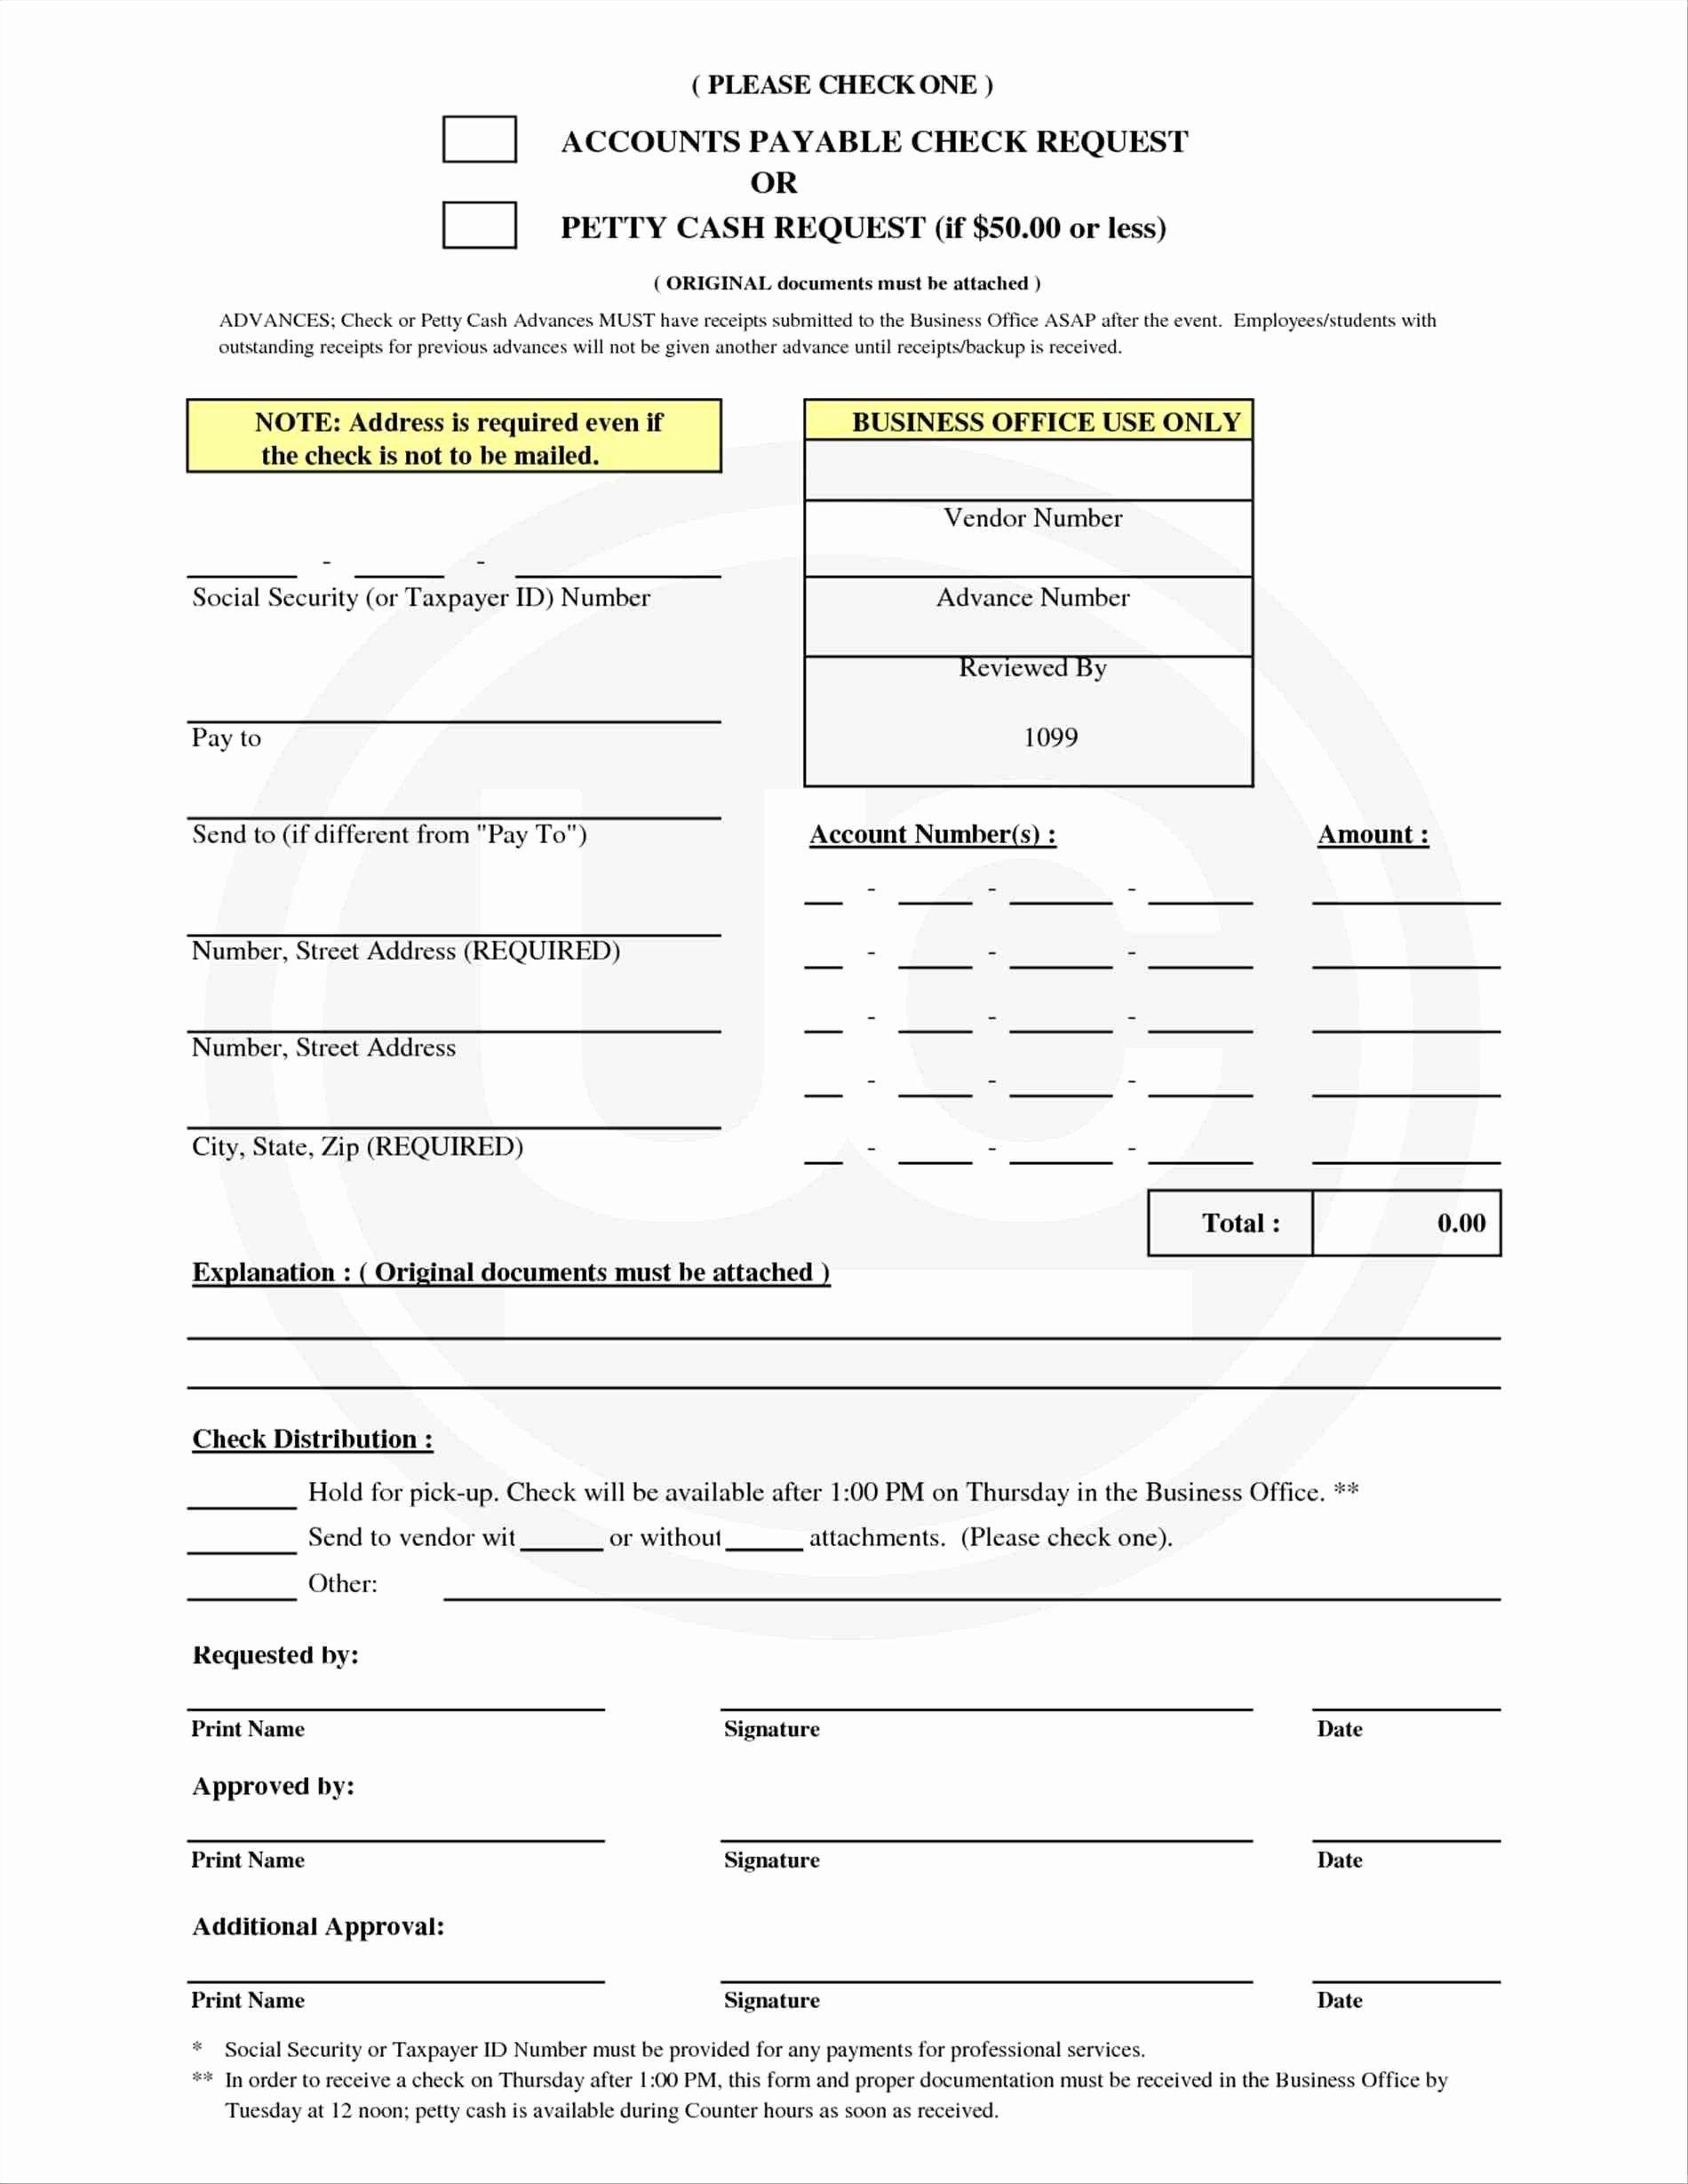 Design Request Form Template Elegant Cash Advance Request Form Template Sign In Sheet Template Sign Up Sheets Master Schedule